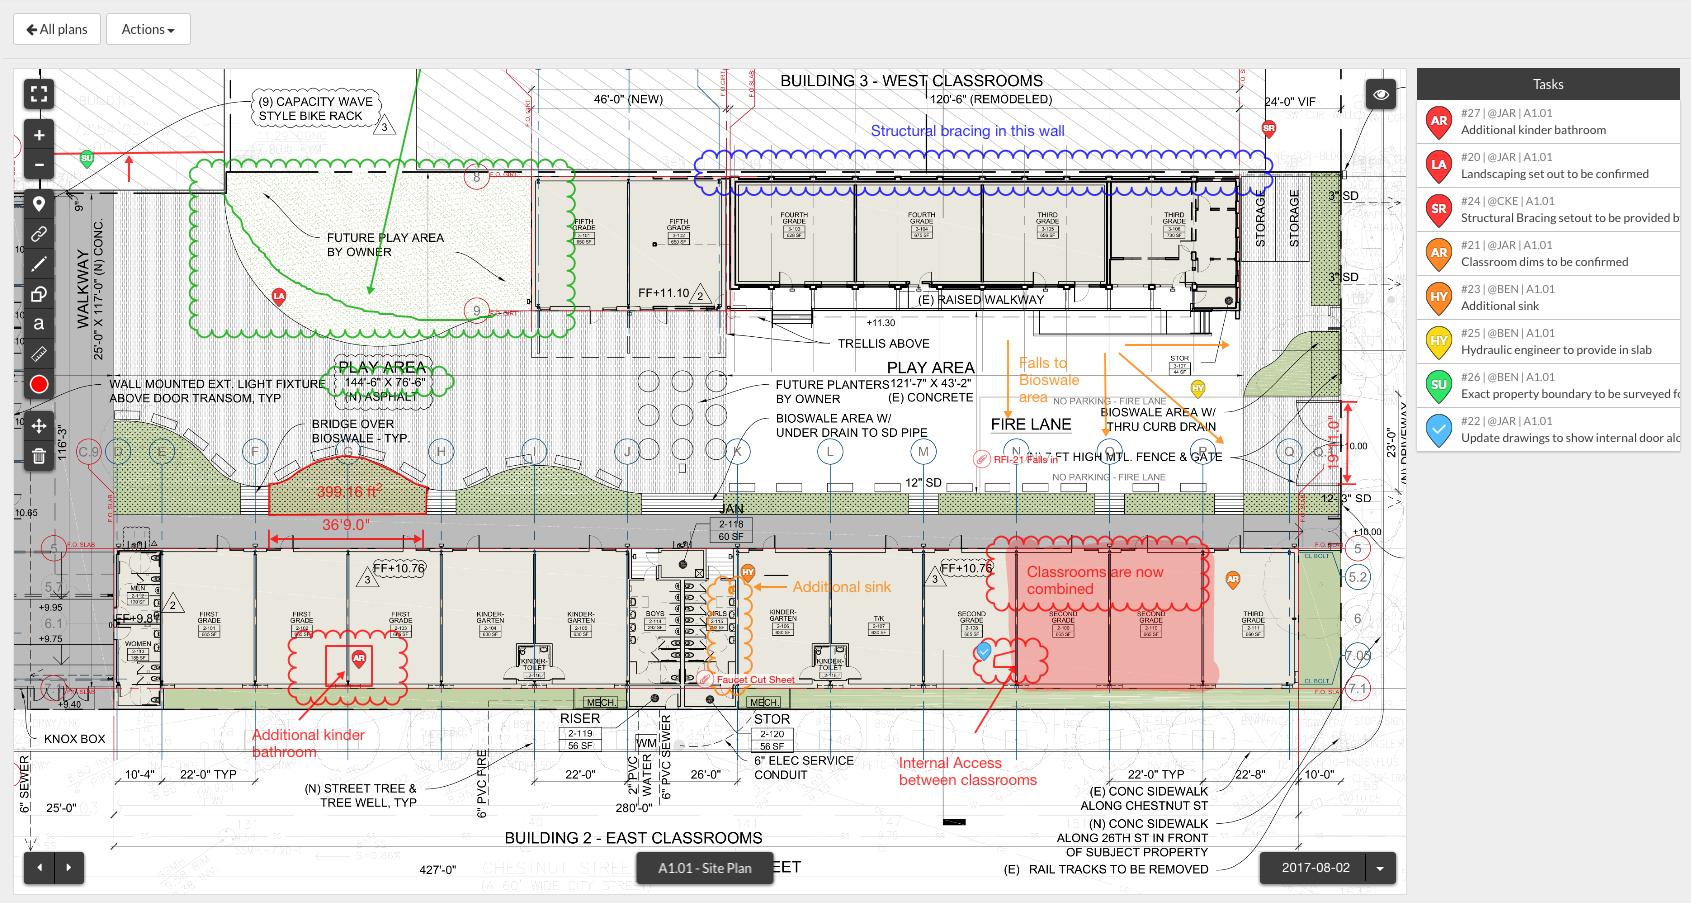 Fieldwire Blog Piping Layout Engineer Jobs In Uae Image